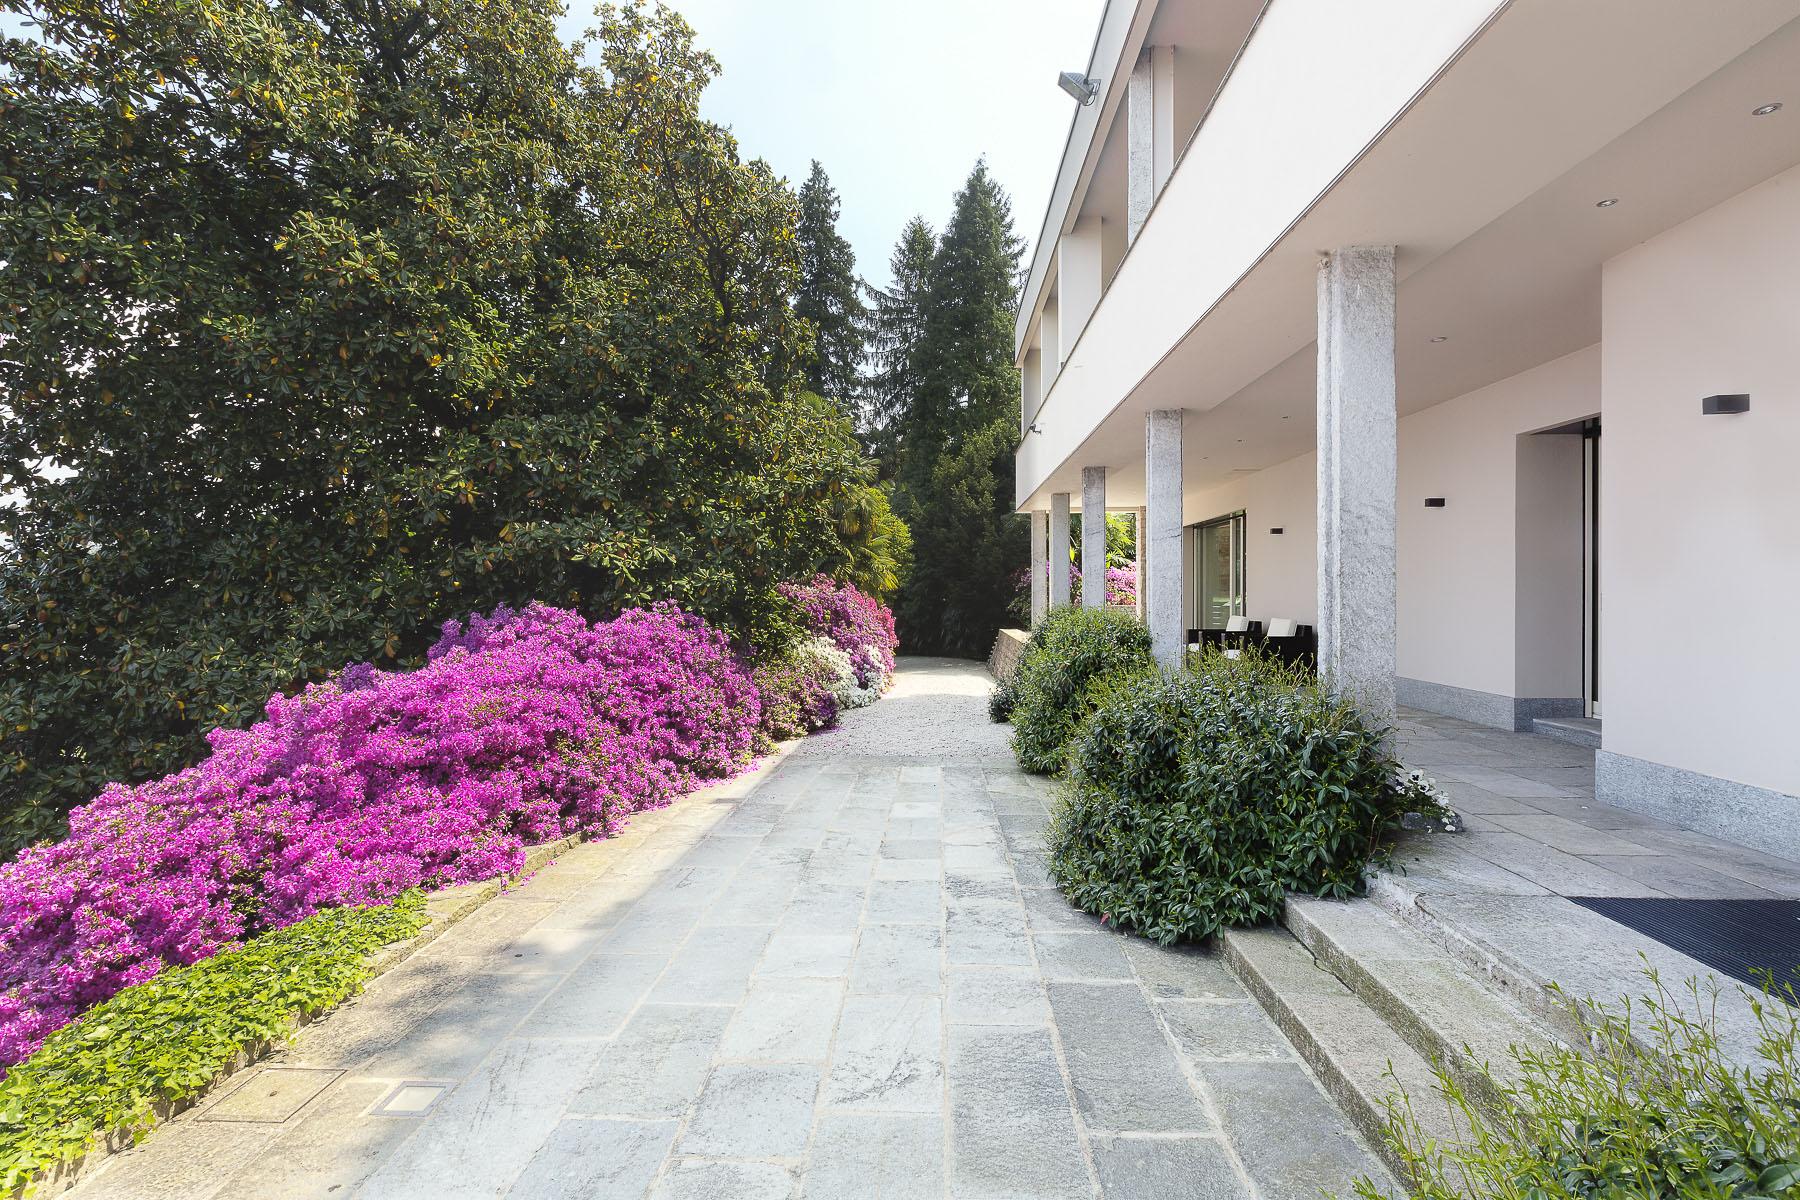 Villa in Vendita a Stresa: 5 locali, 1440 mq - Foto 6